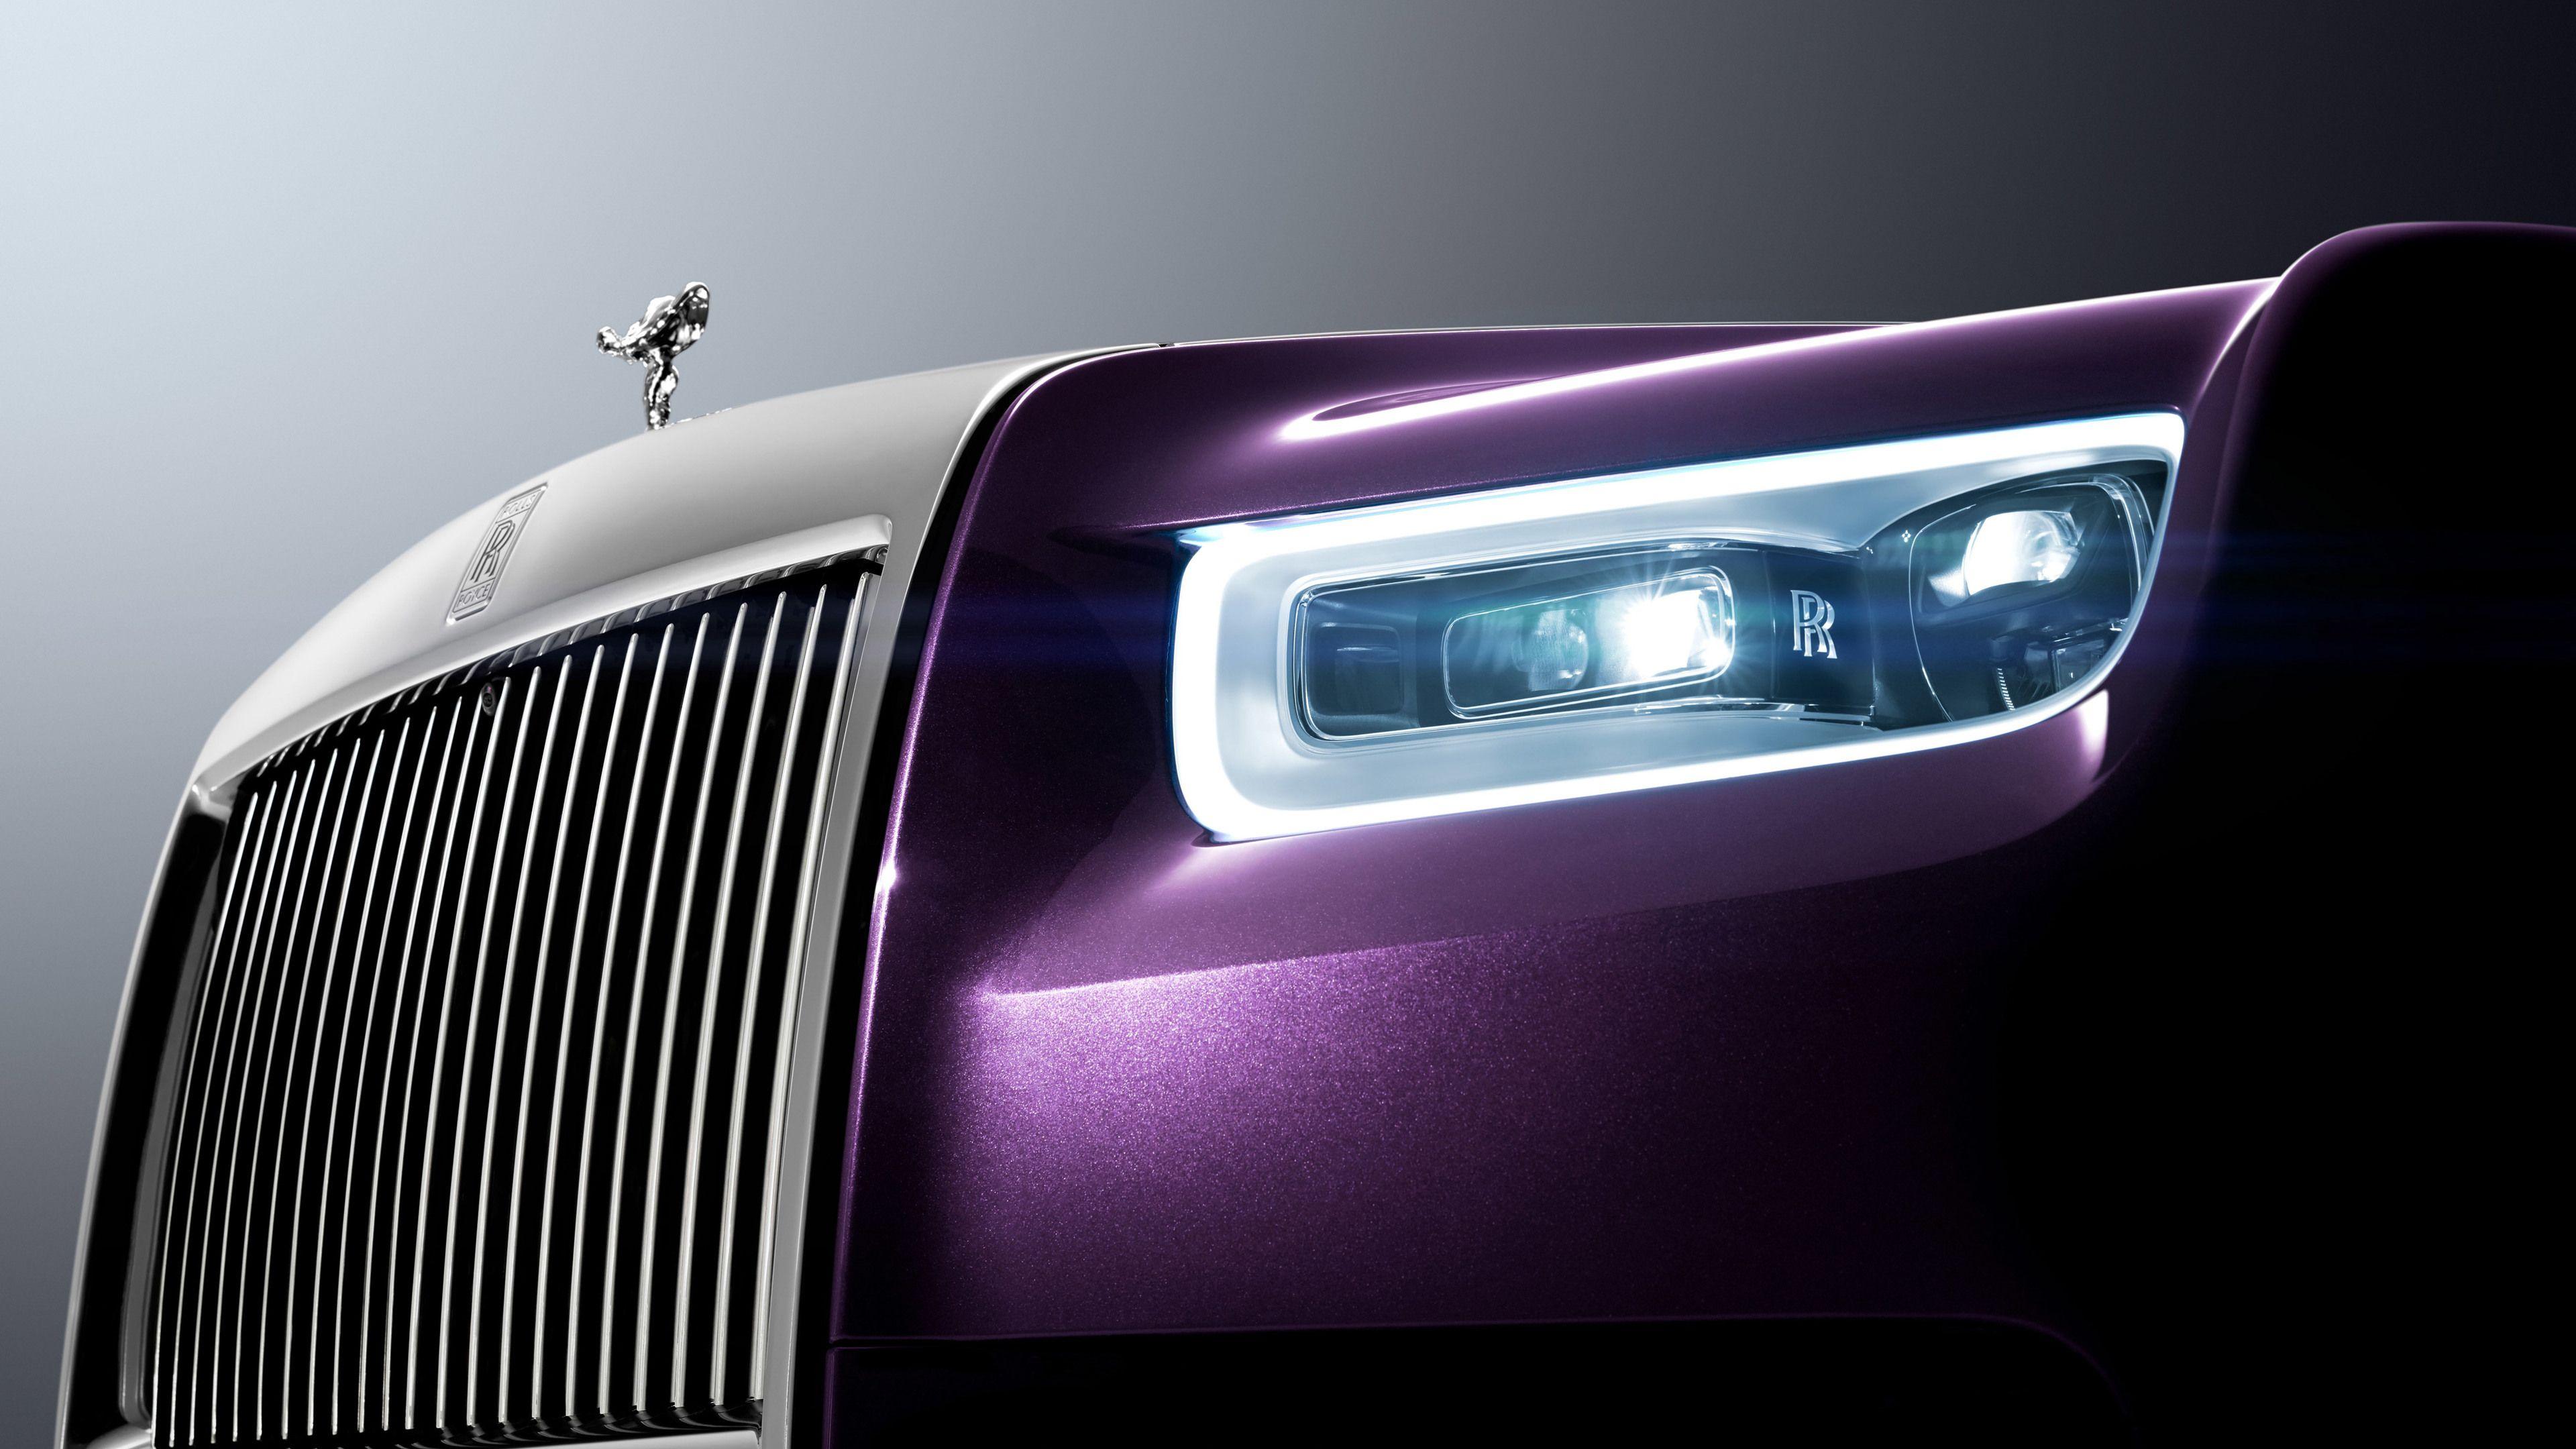 Rolls Royce Phantom Ewb Rolls Royce Wallpapers Rolls Royce Phantom Wallpapers Rolls Royce Phantom Ewb W Rolls Royce Rolls Royce Wallpaper Rolls Royce Phantom